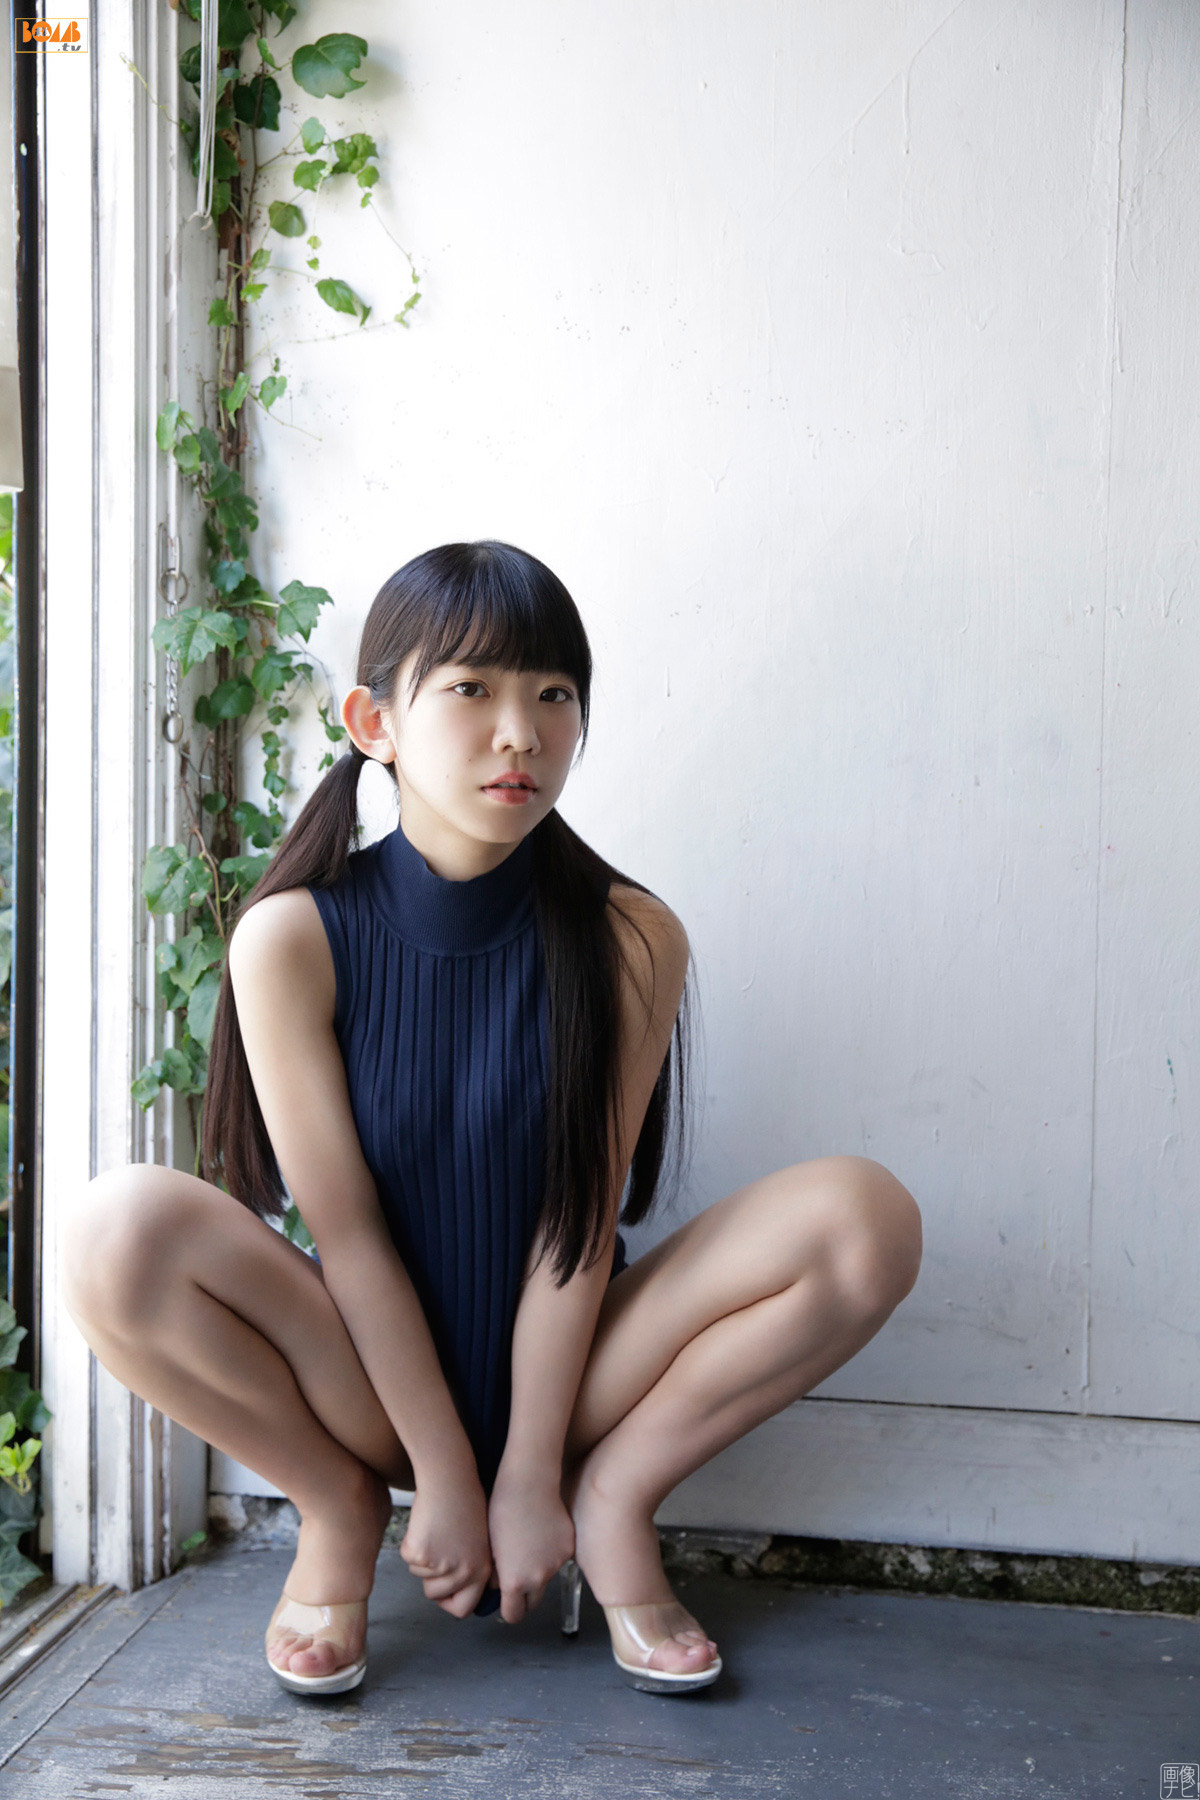 nagasawa_marina081.jpg